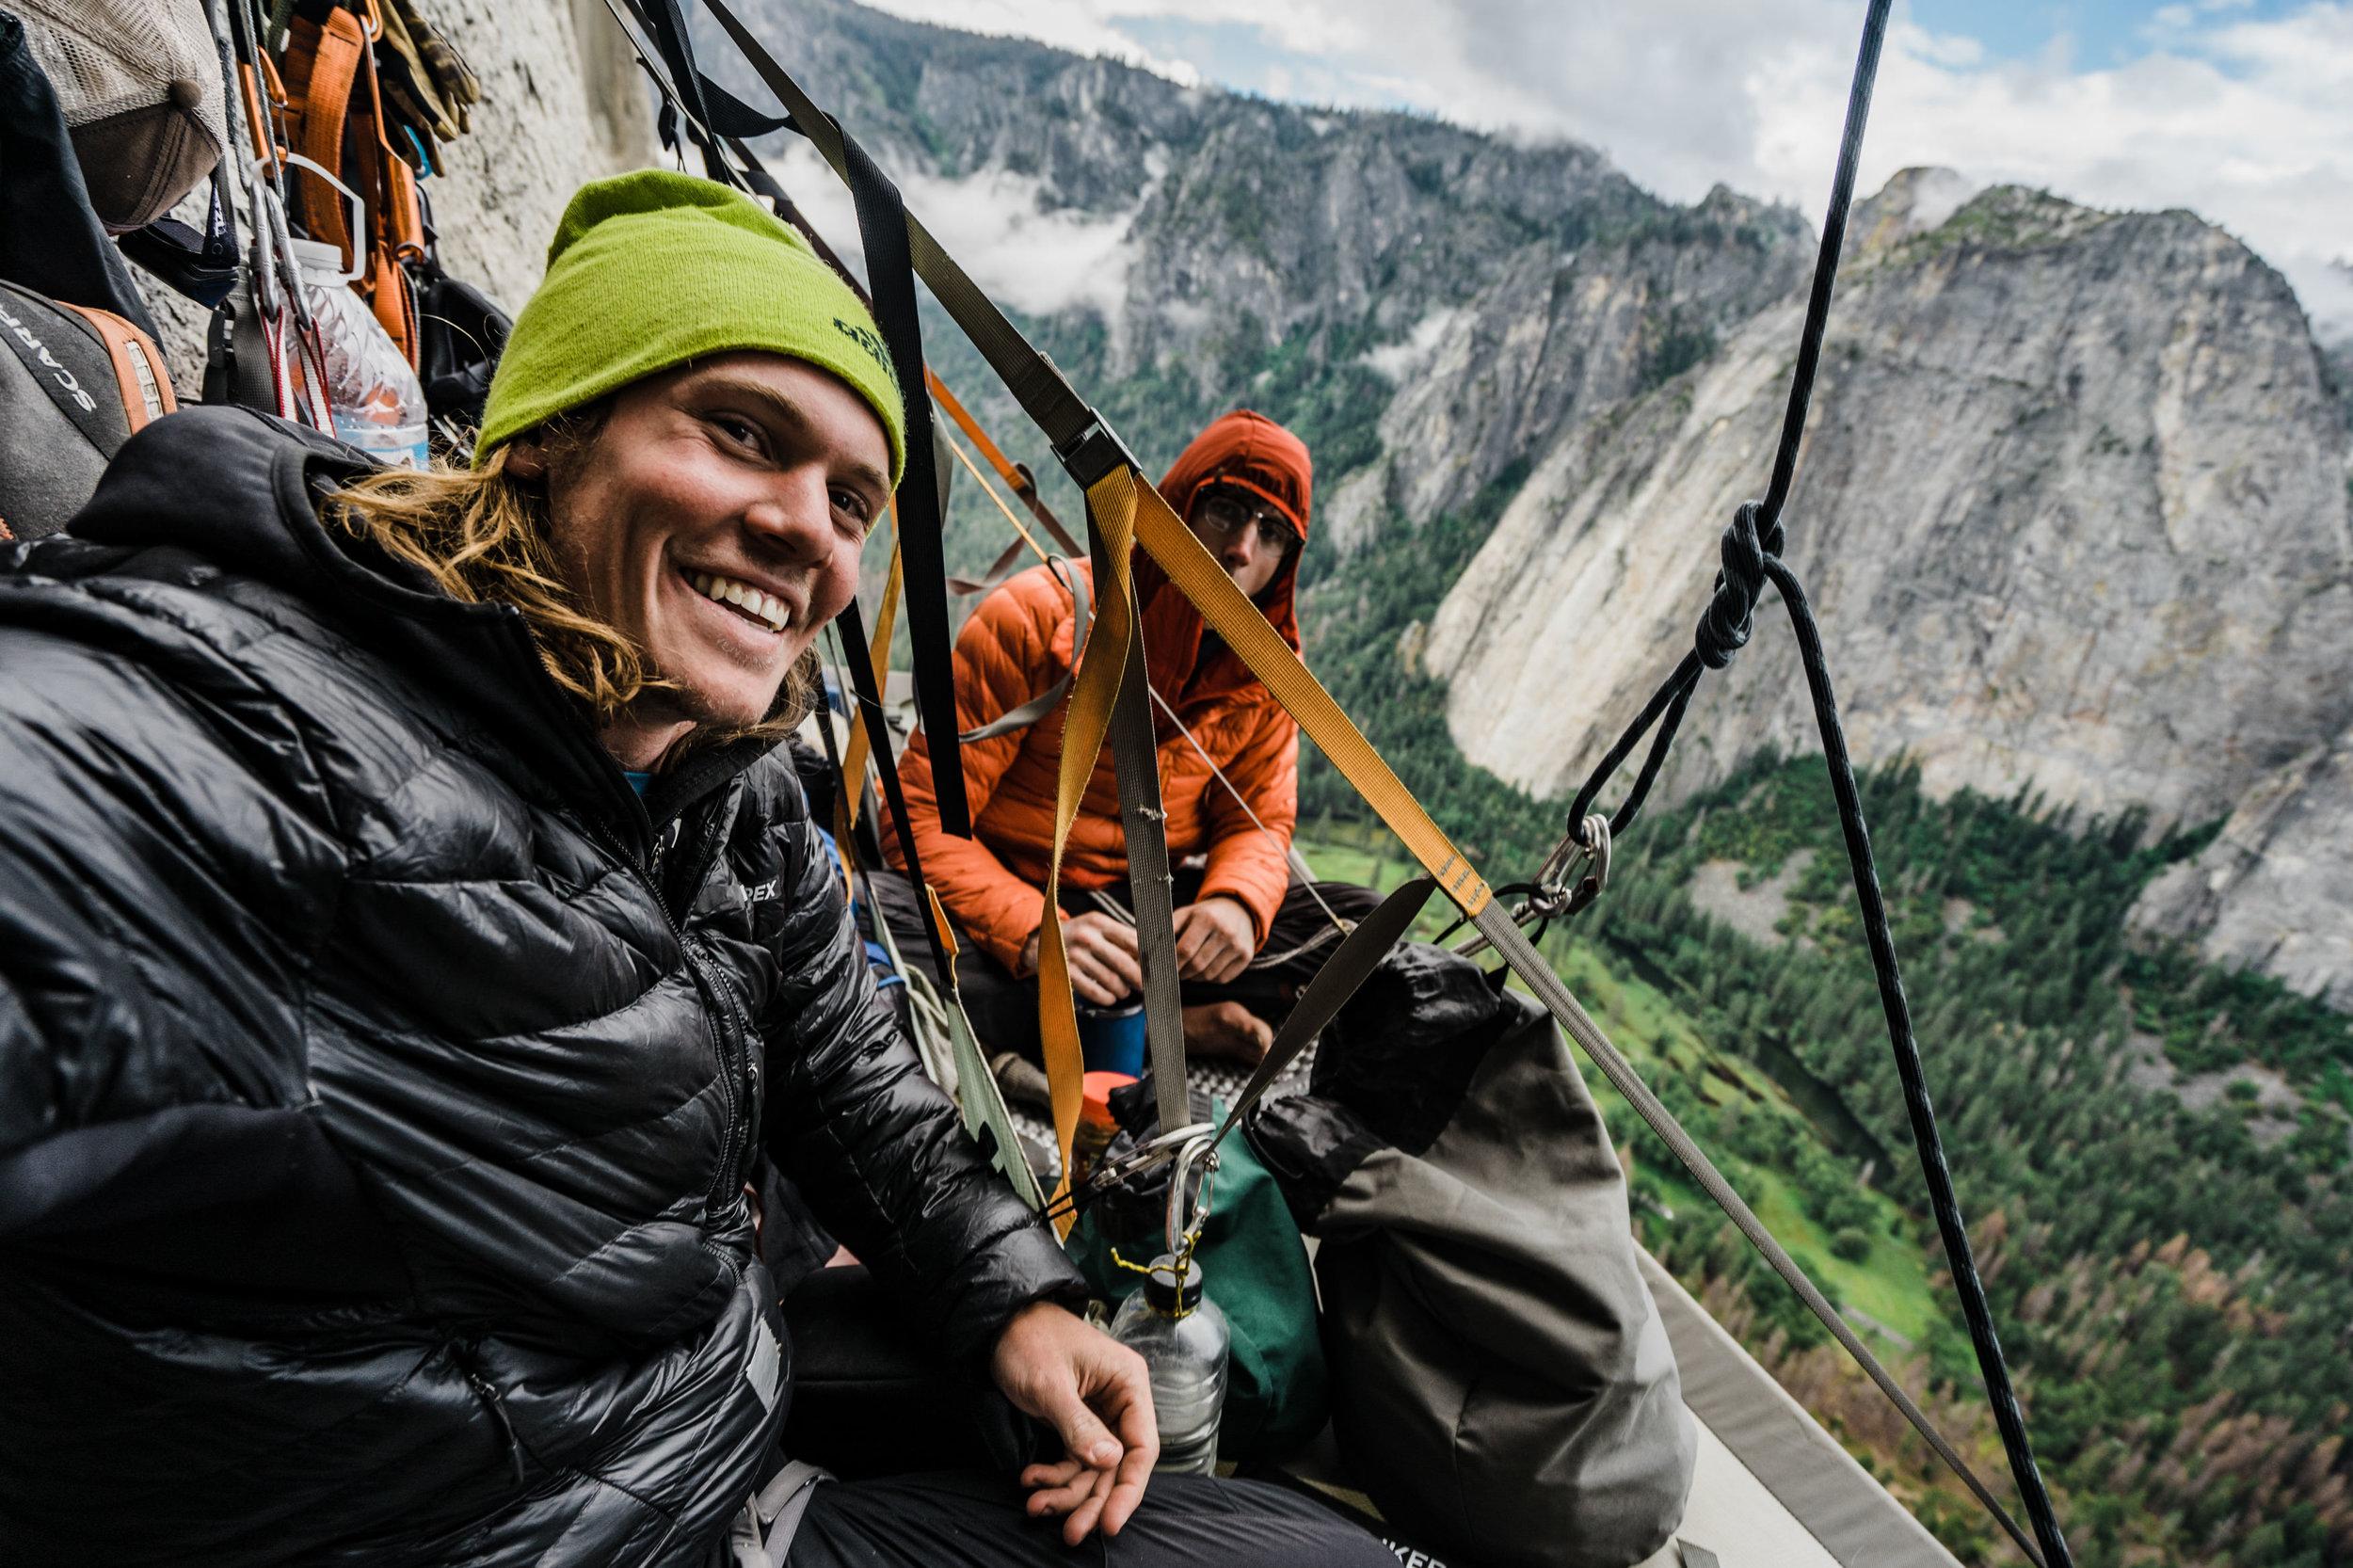 climbing el capitan in yosemite national park | freerider on el cap | yosemite adventure photographer